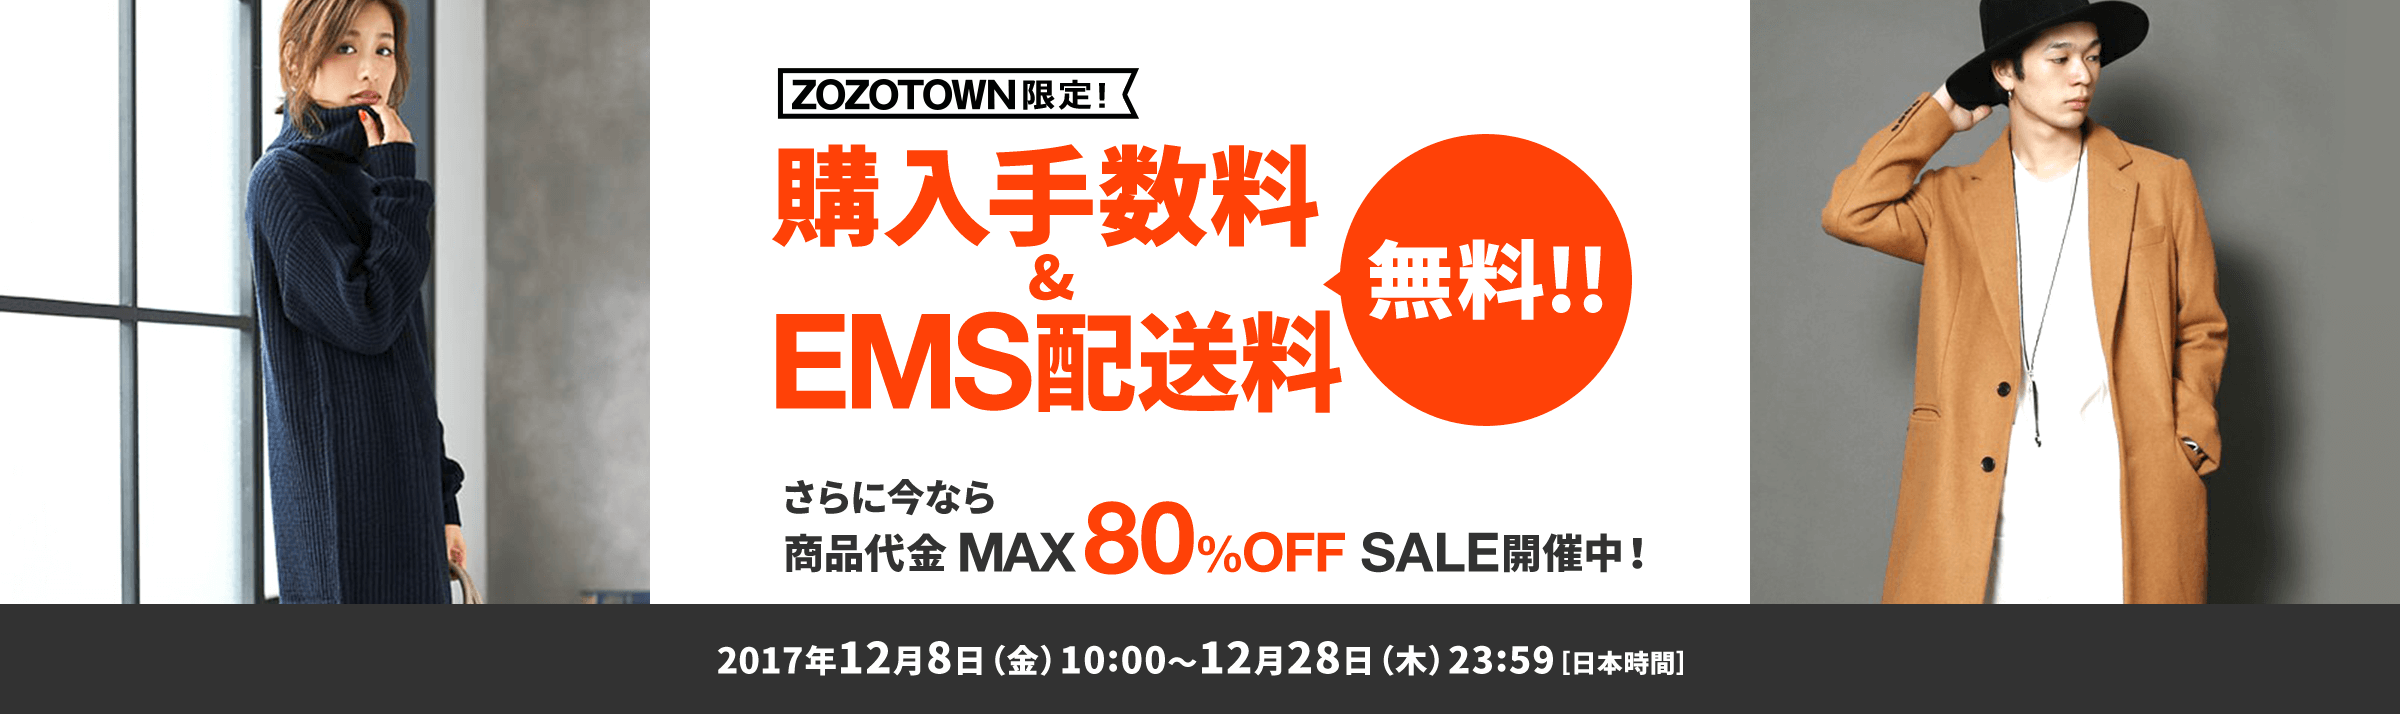 ZOZOTOWN限定!購入手数料&EMS国際配送料無料!!